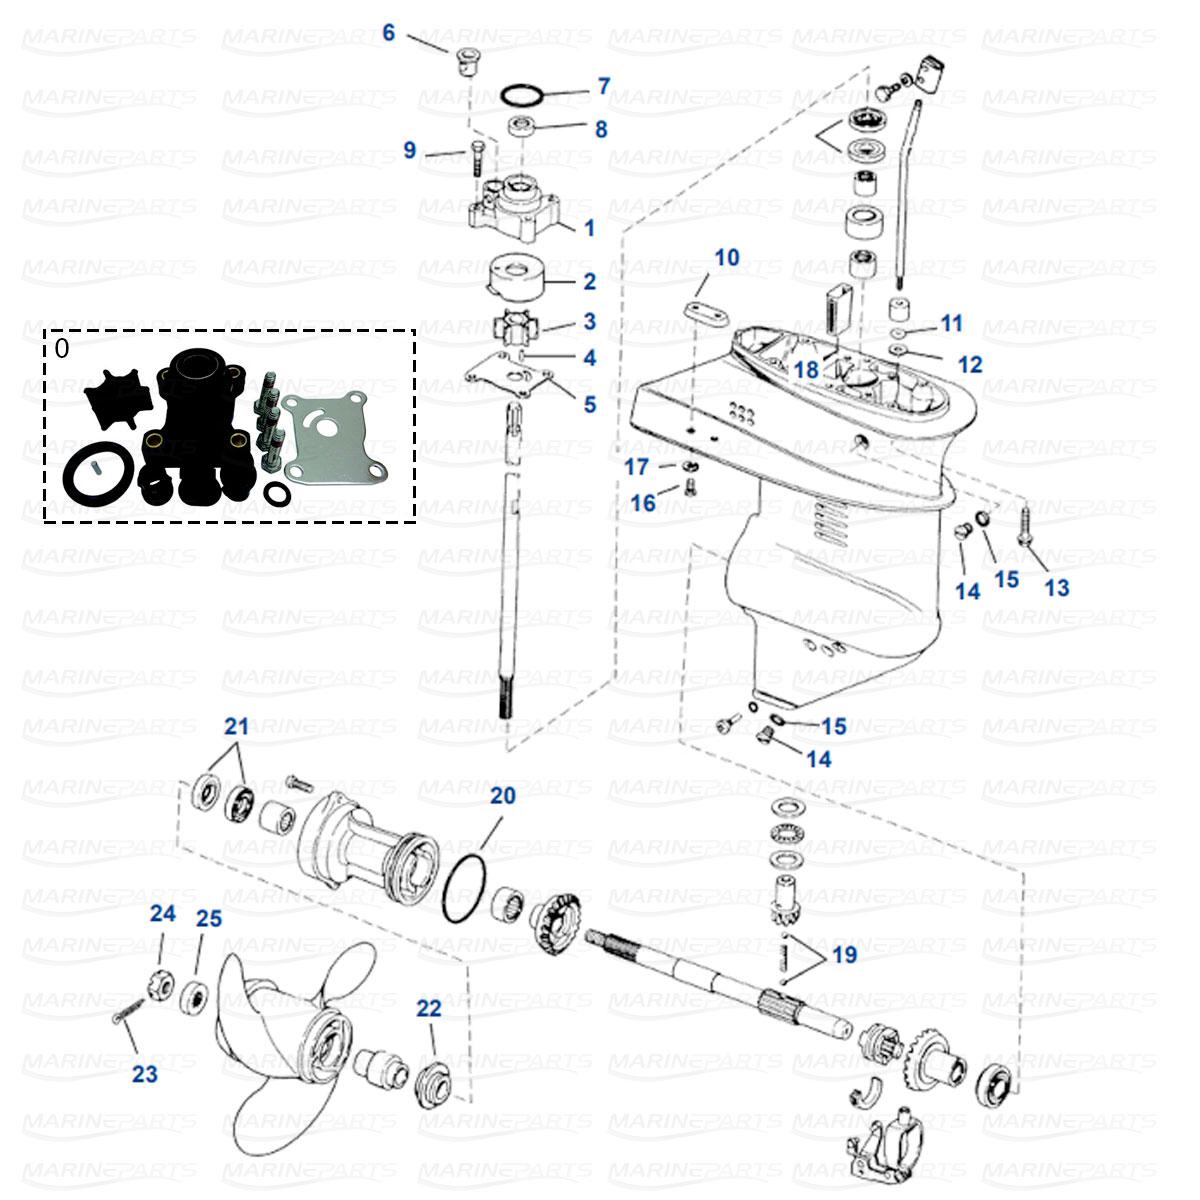 Gearcase parts 9.9-15 HP (1974+)